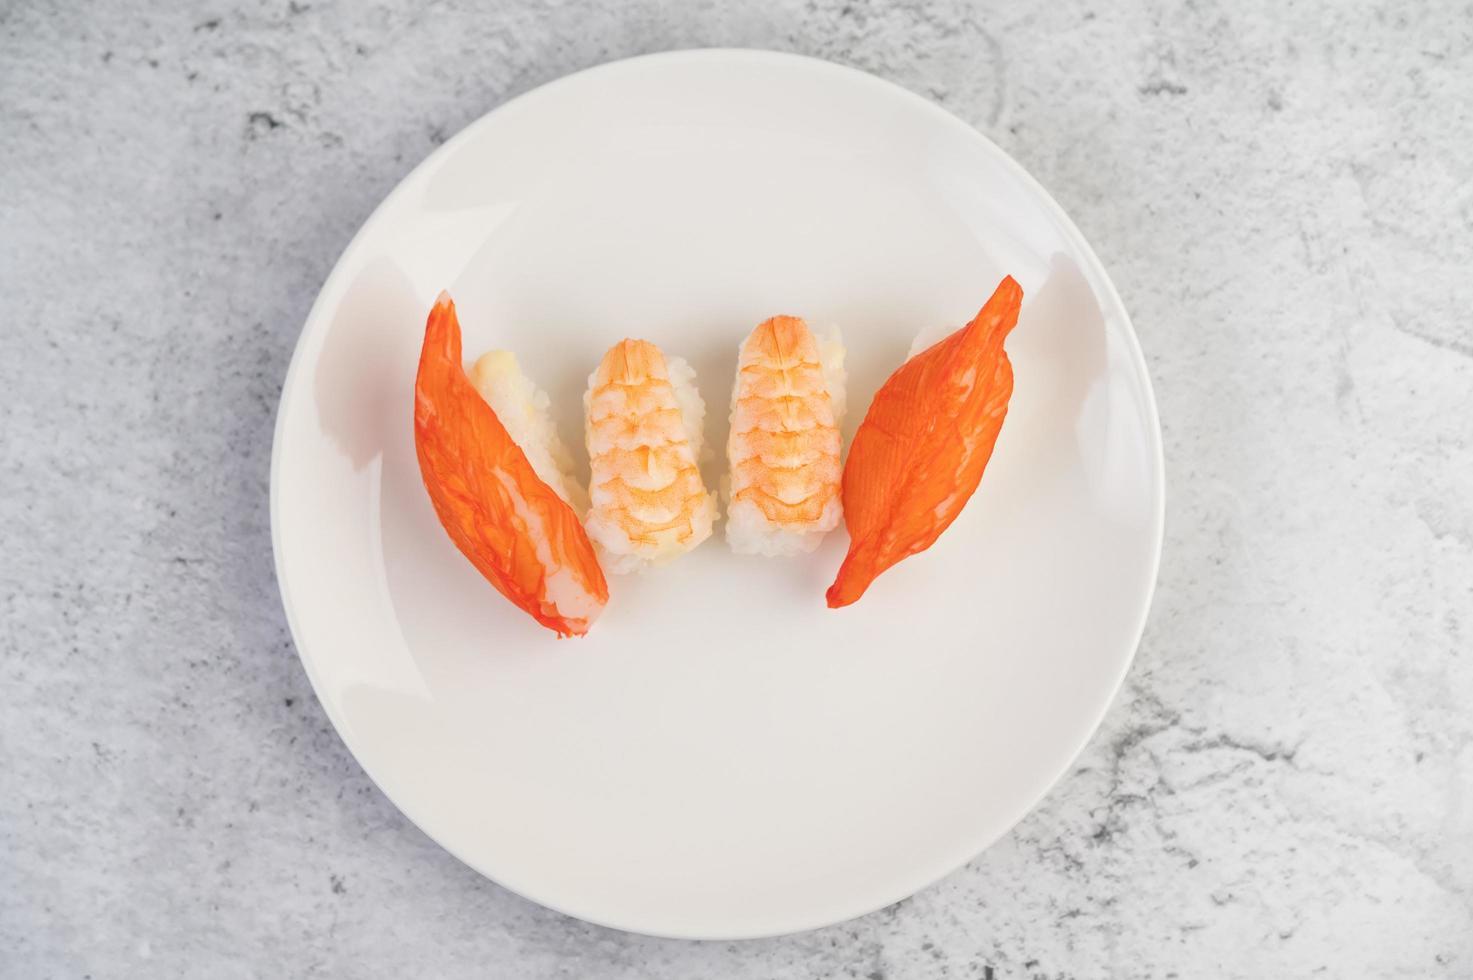 verschiedene Sushi-Rollen foto